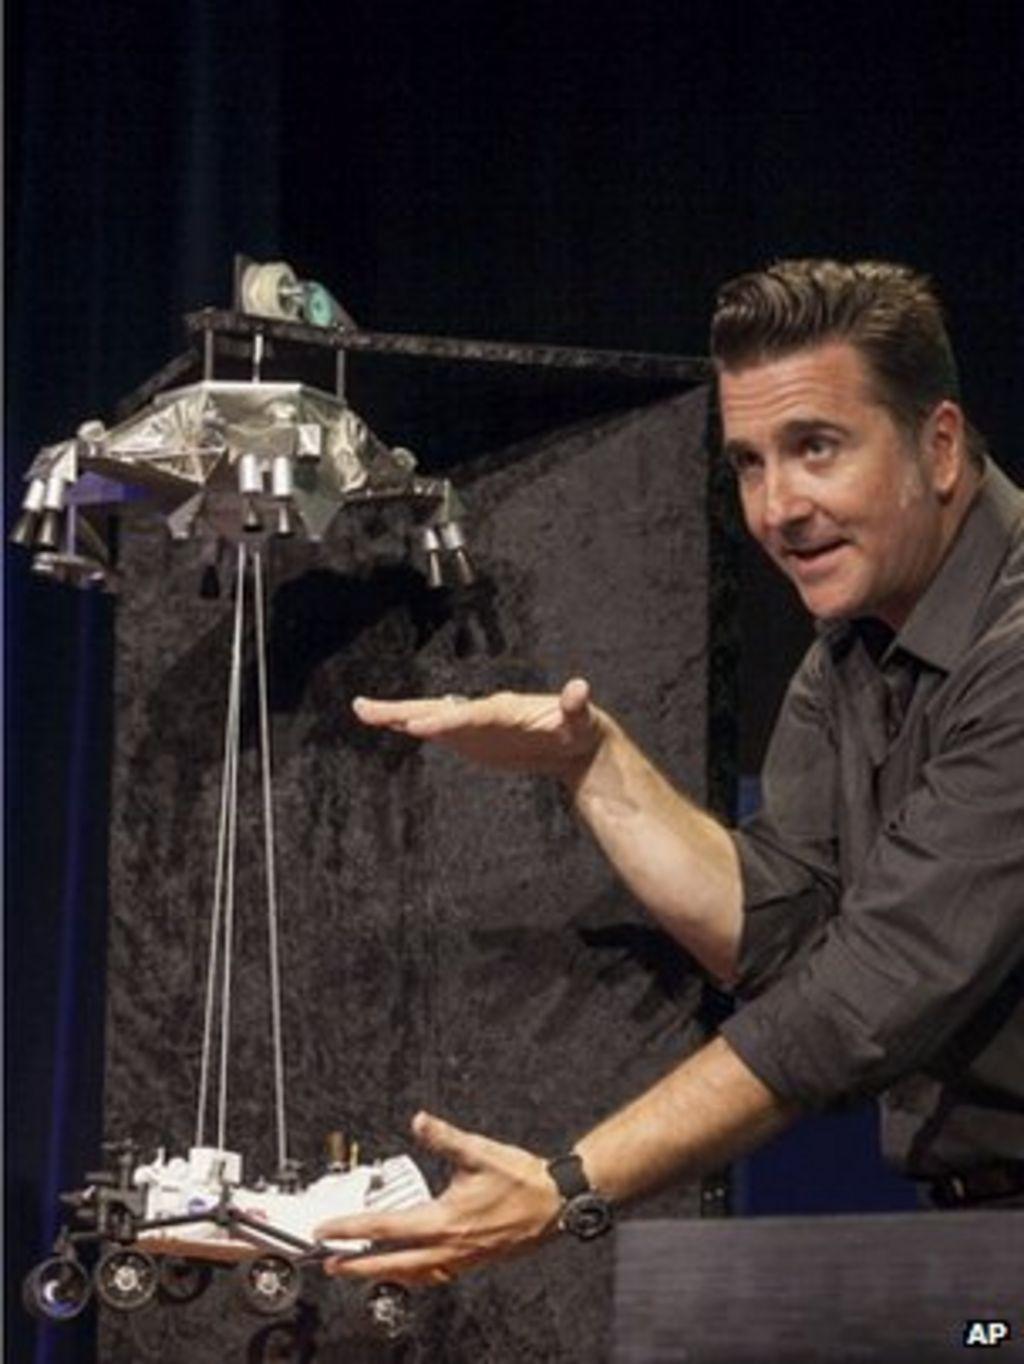 bbc news on mars landing - photo #4